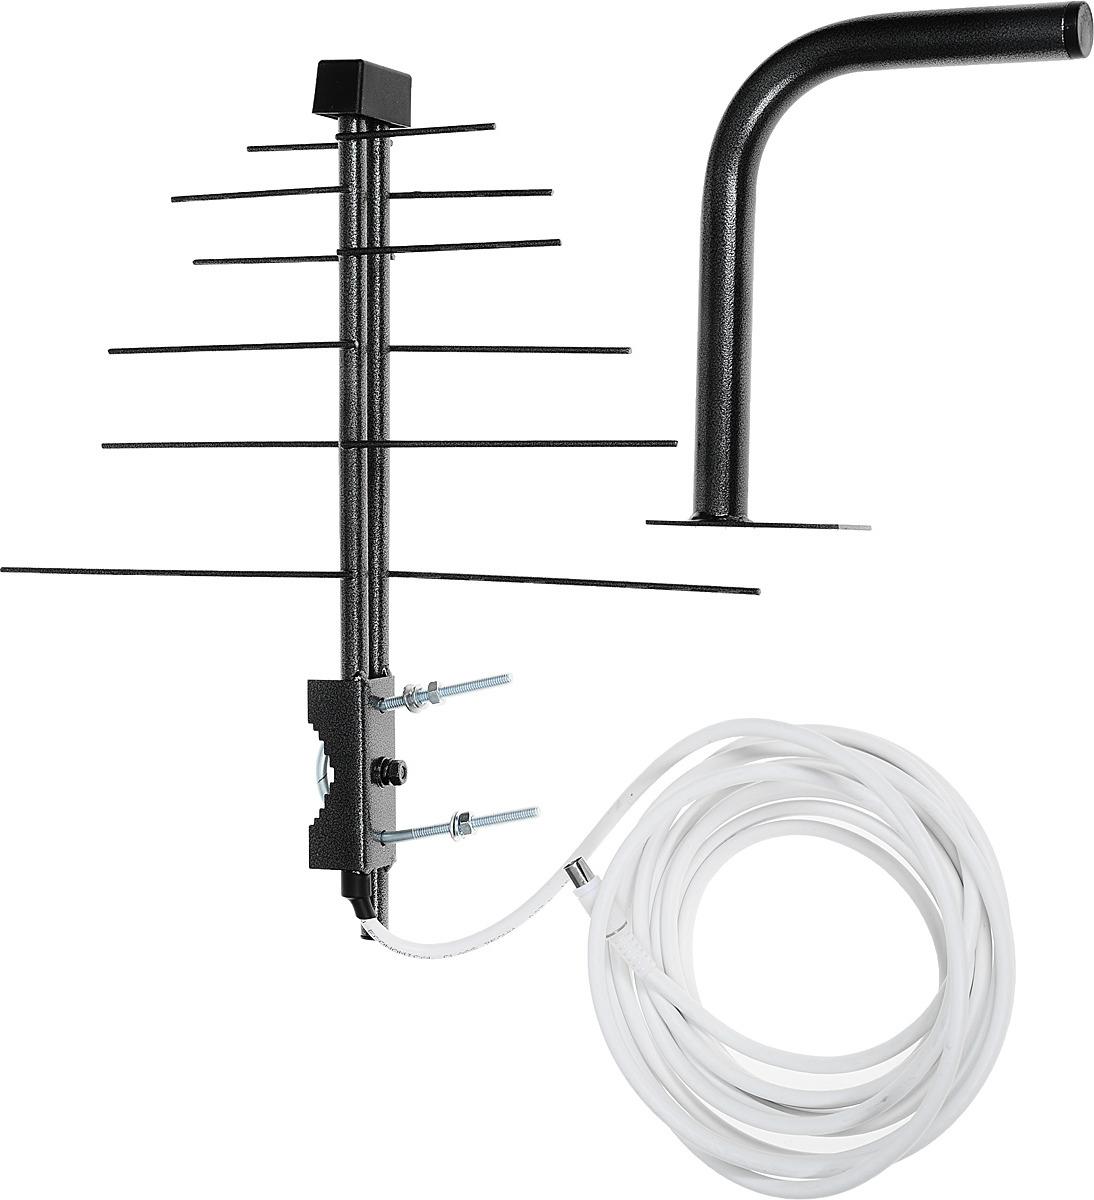 РЭМО BAS-1109-P Селена-мини, Black уличная ТВ-антенна (пассивная) цены онлайн